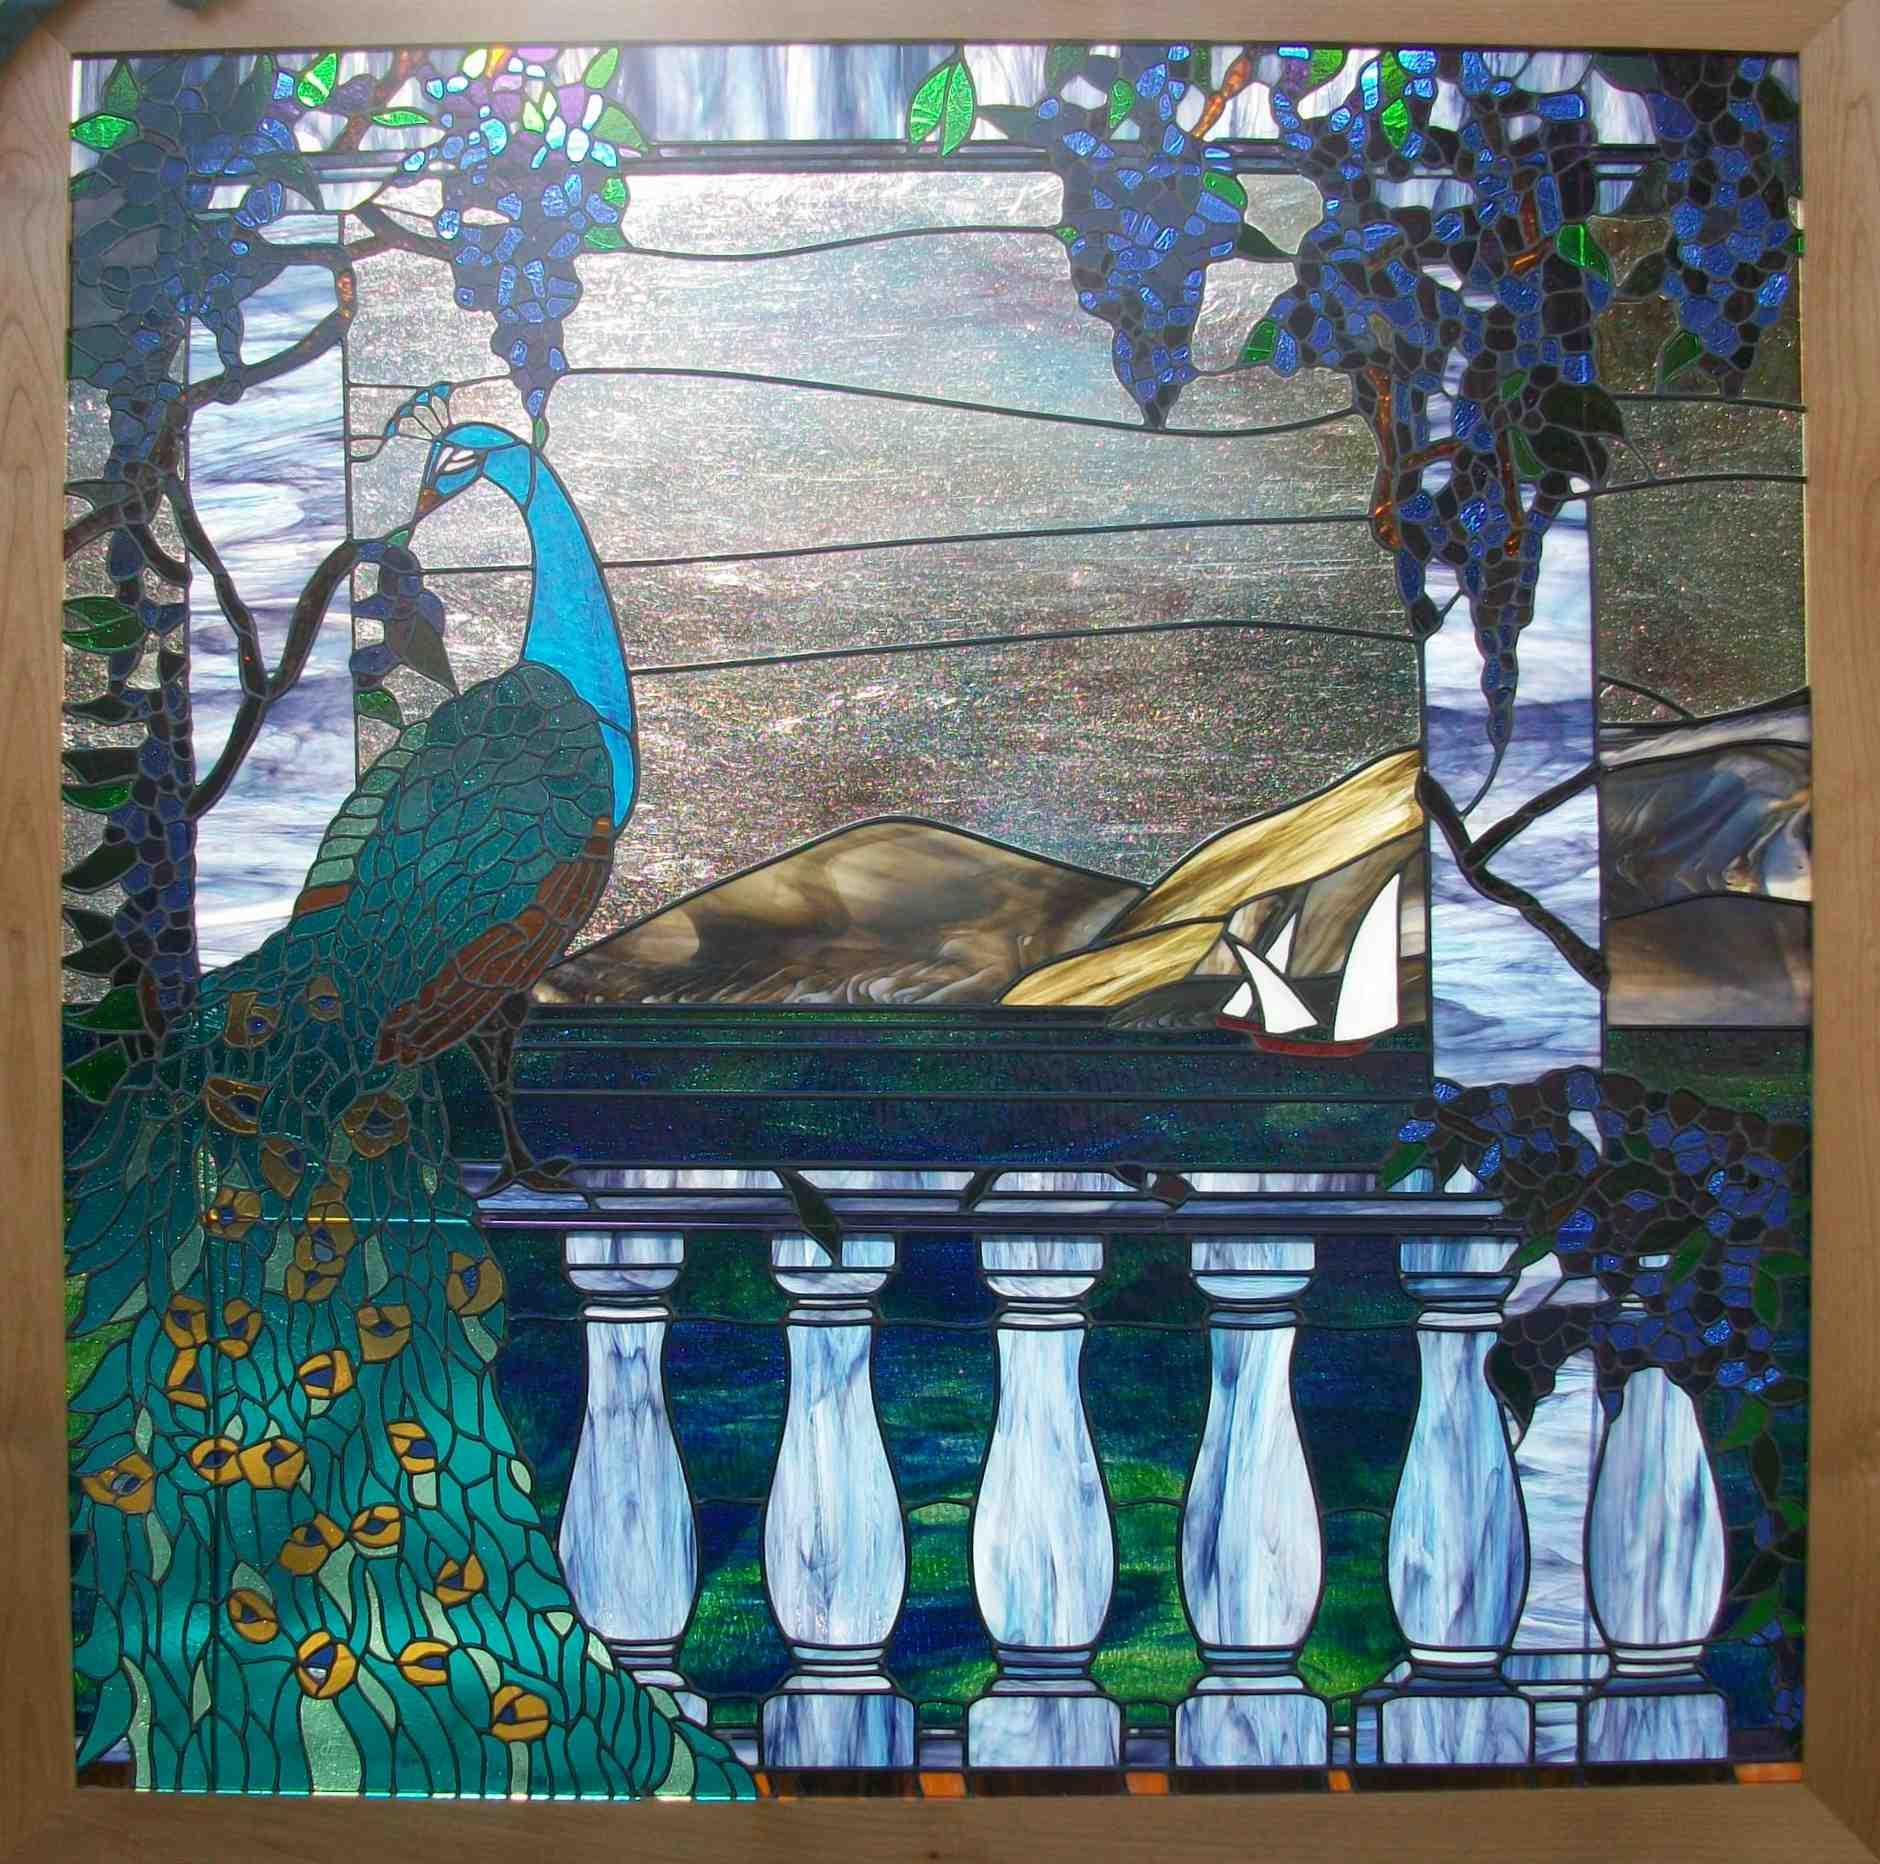 peacock-8.jpg